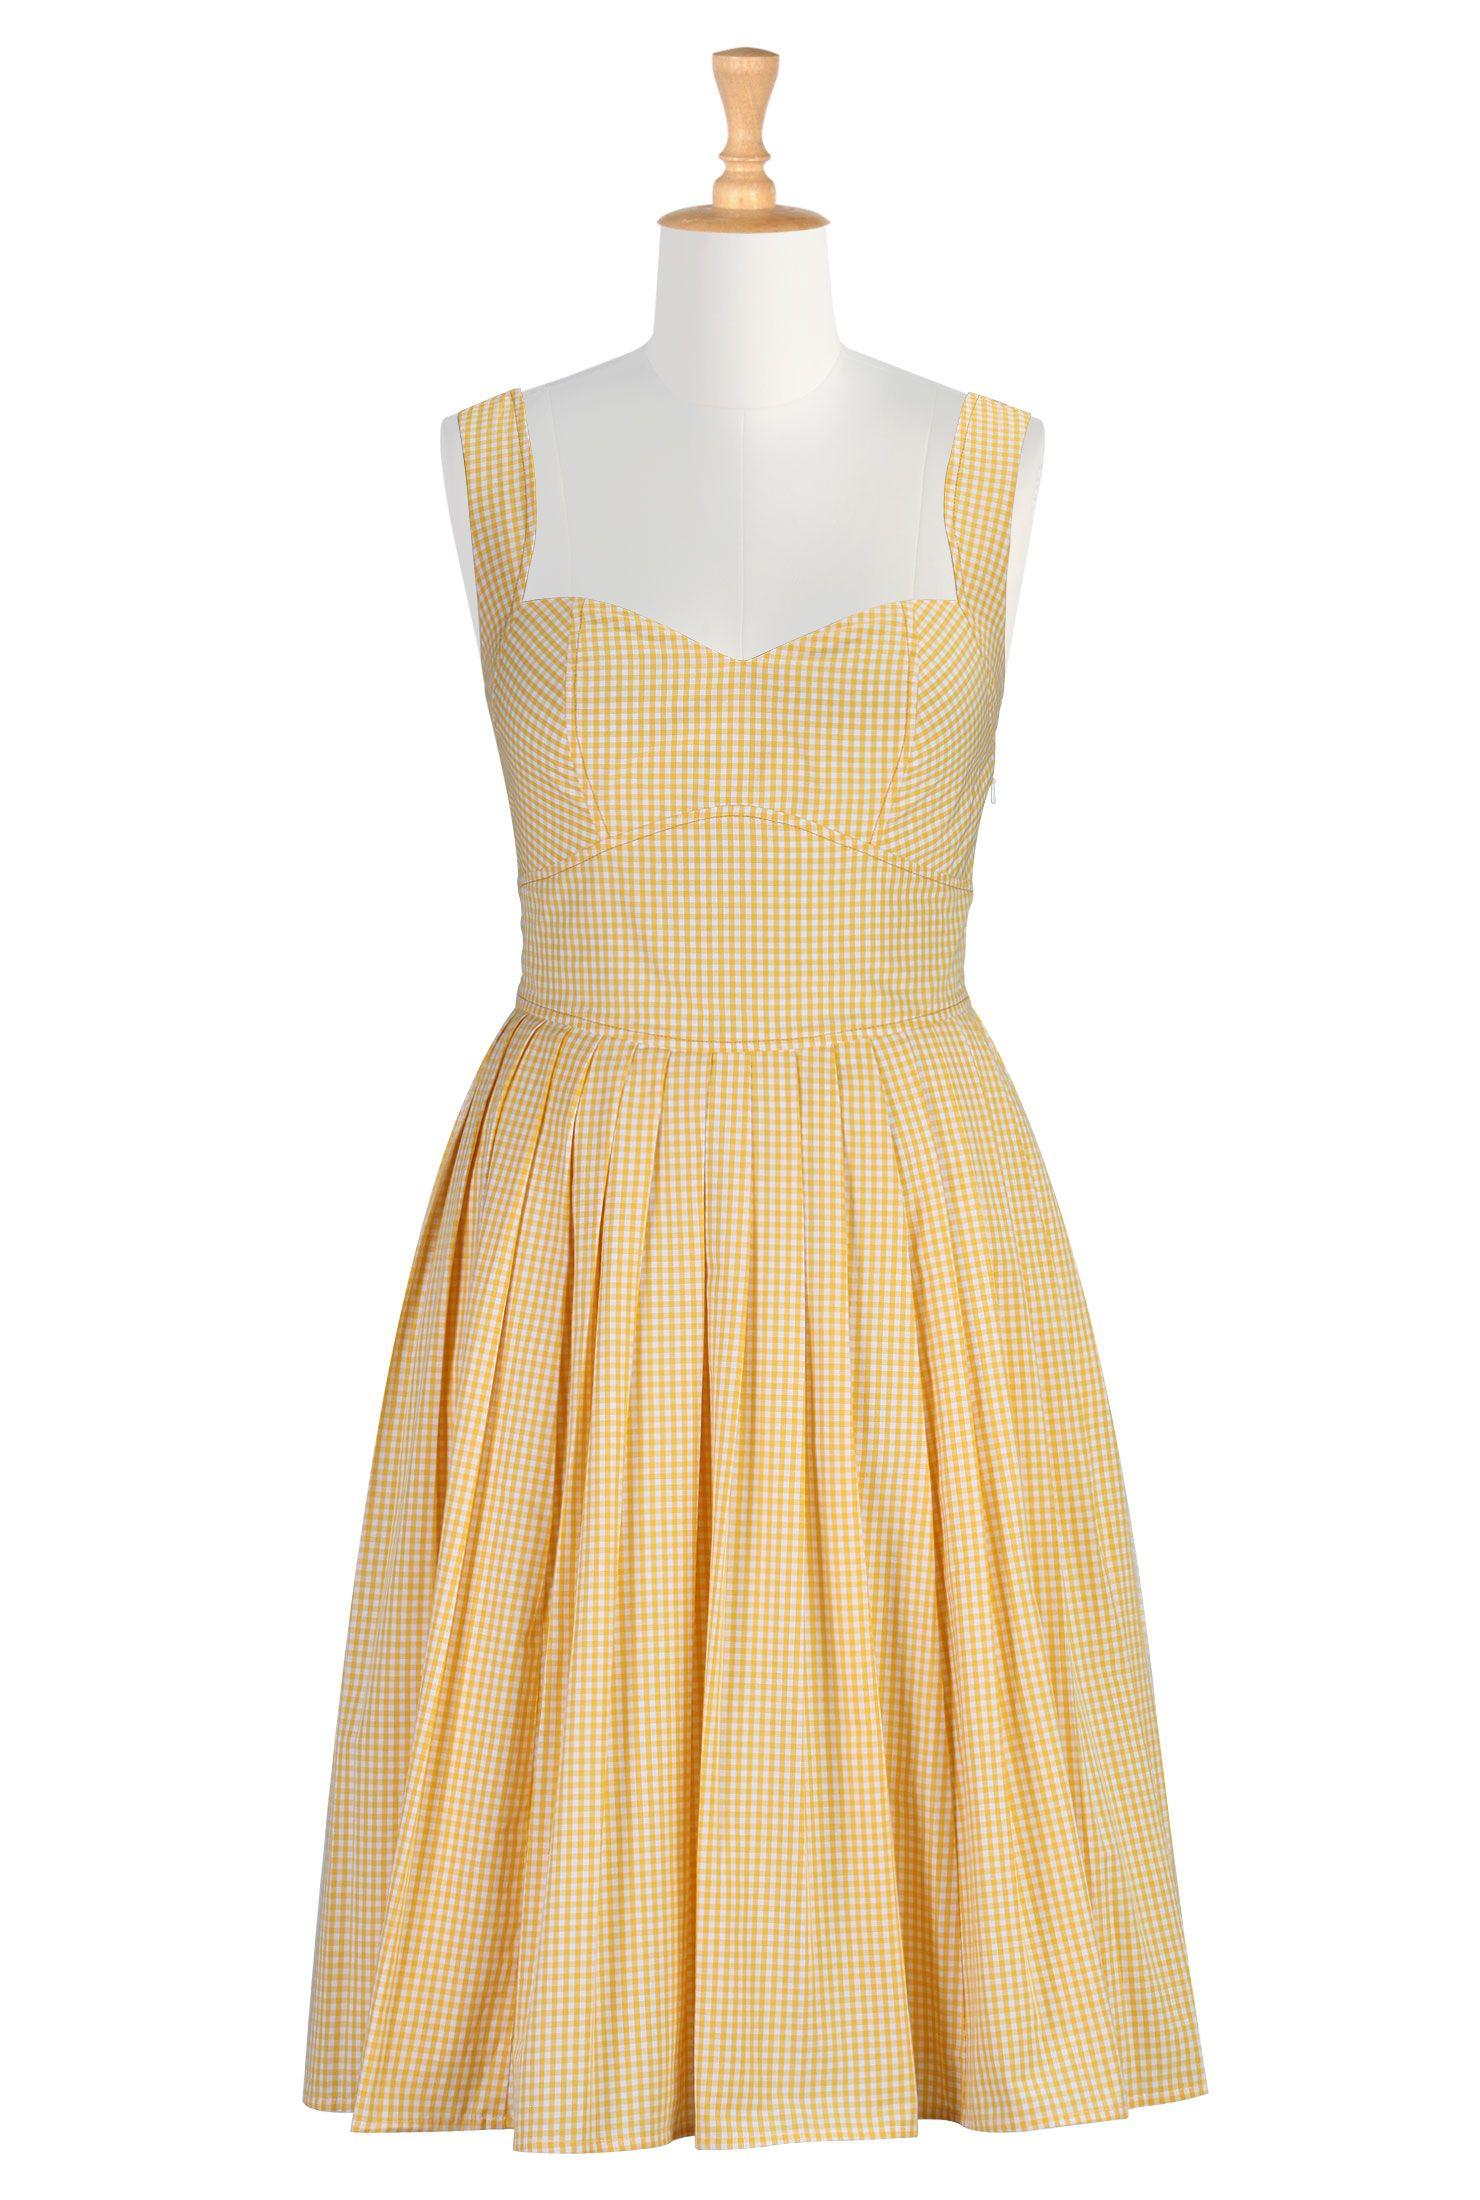 her fifties gingham check dress | petite sundresses, sundresses